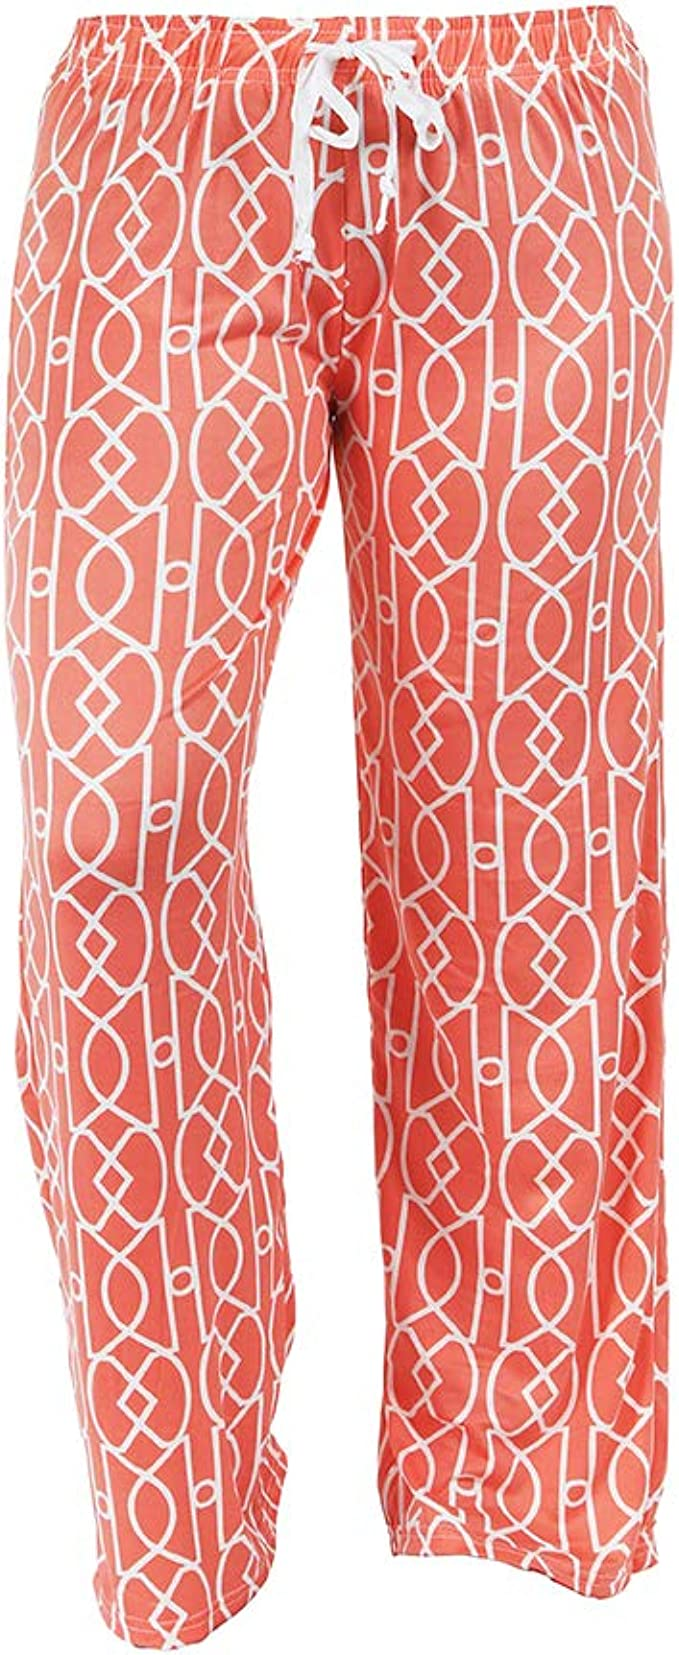 Hello Mello Trendy Womens Loungewear Pants With Luxurious Soft Fabric And Adjustable Elastic Waistband Garden Awake Break